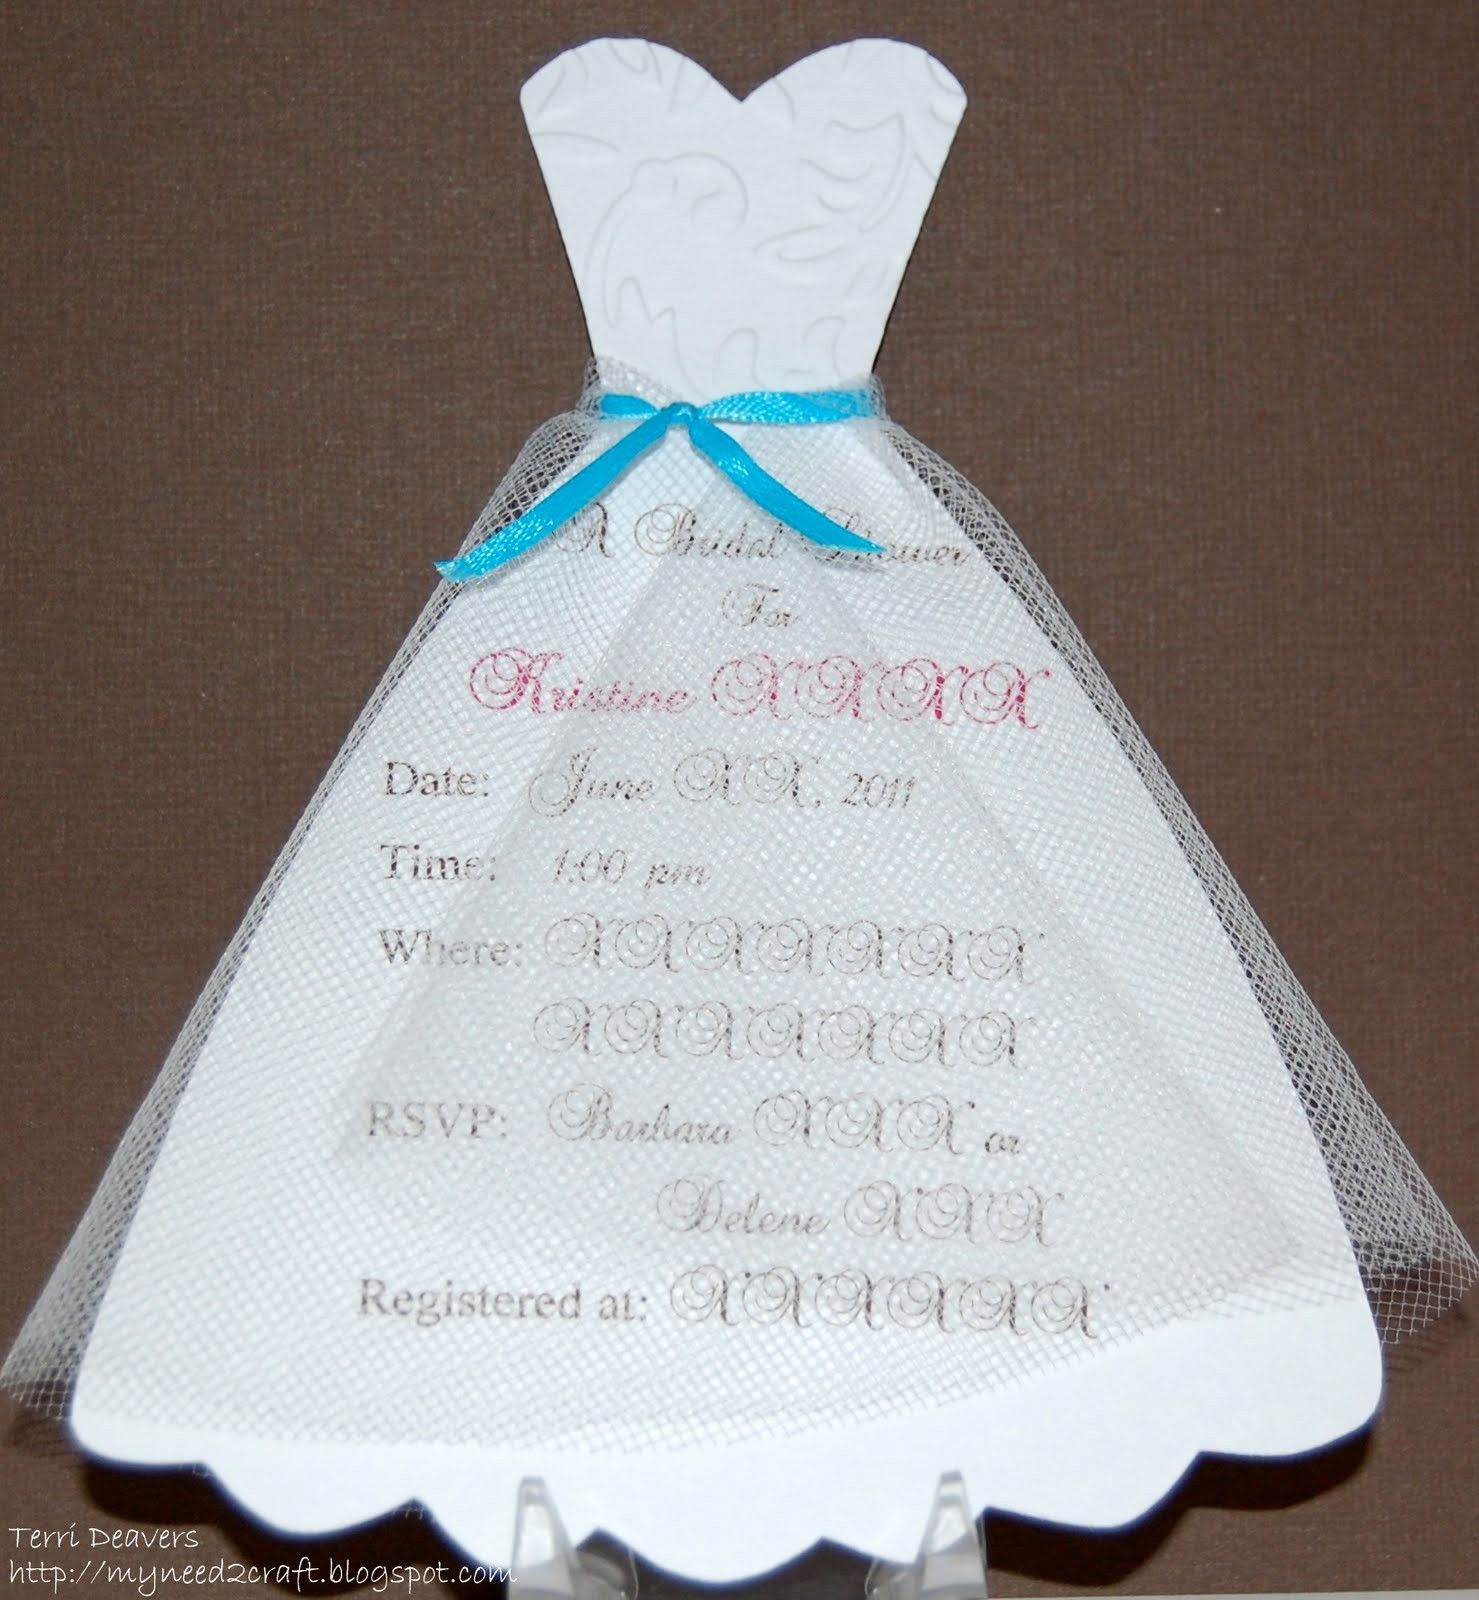 Unique Wedding Invitation Cards Designs Google Sear On The Best Make ...